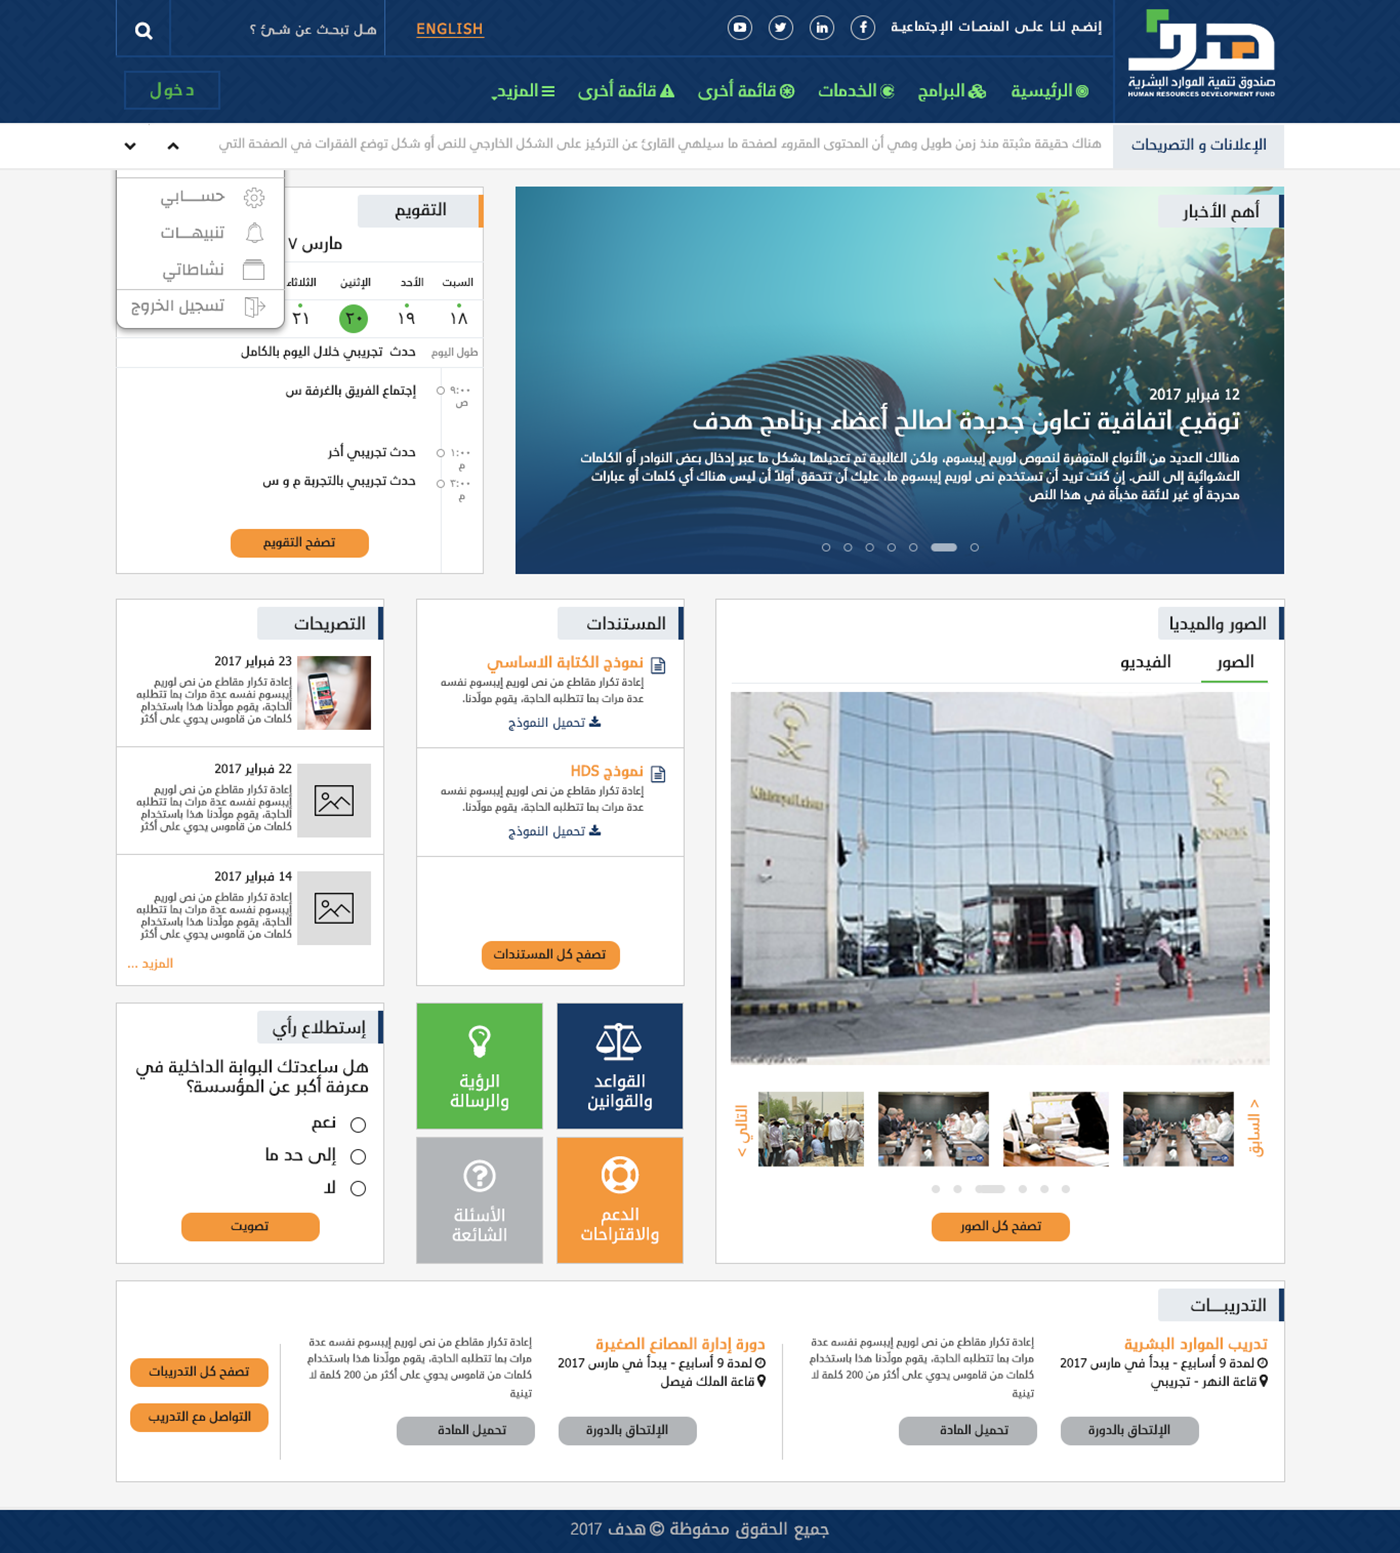 portals,portal,Web Design ,UI/UX,ui design,design,KSA,internal,governmental,ministry of labor